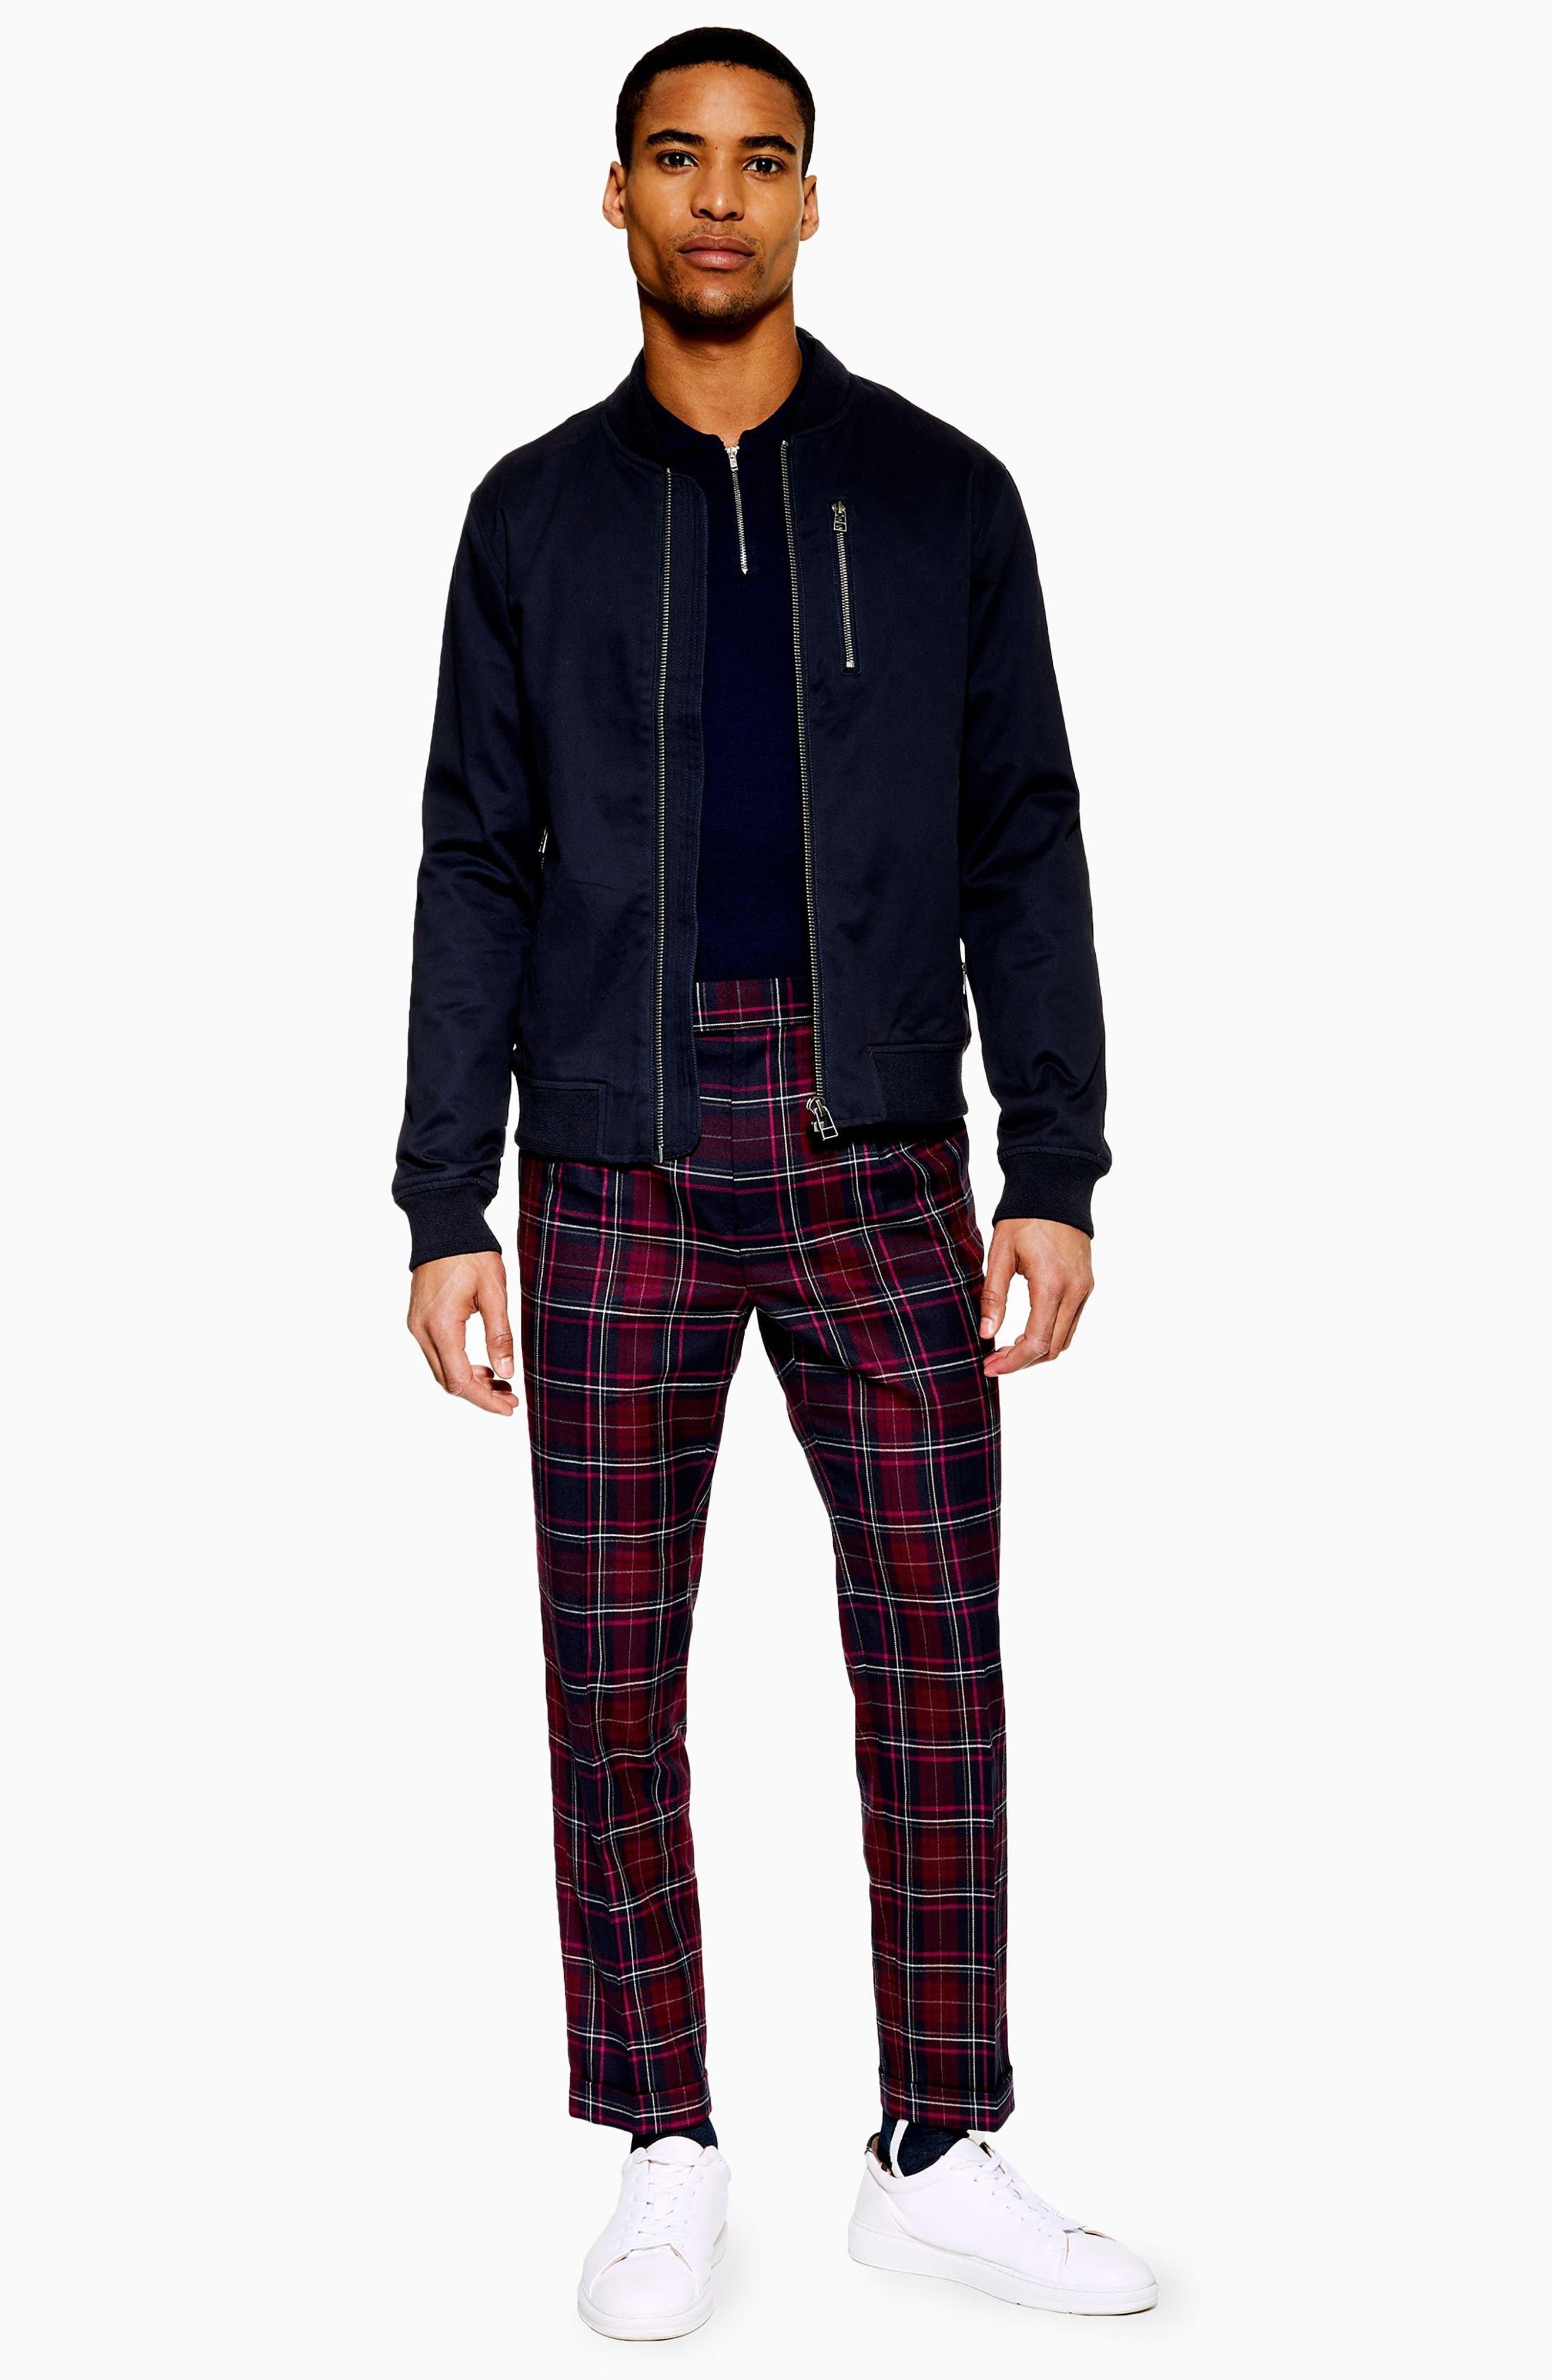 TOPMAN, Skinny Fit Check Trousers, Alternate thumbnail 4, color, BURGUNDY MULTI